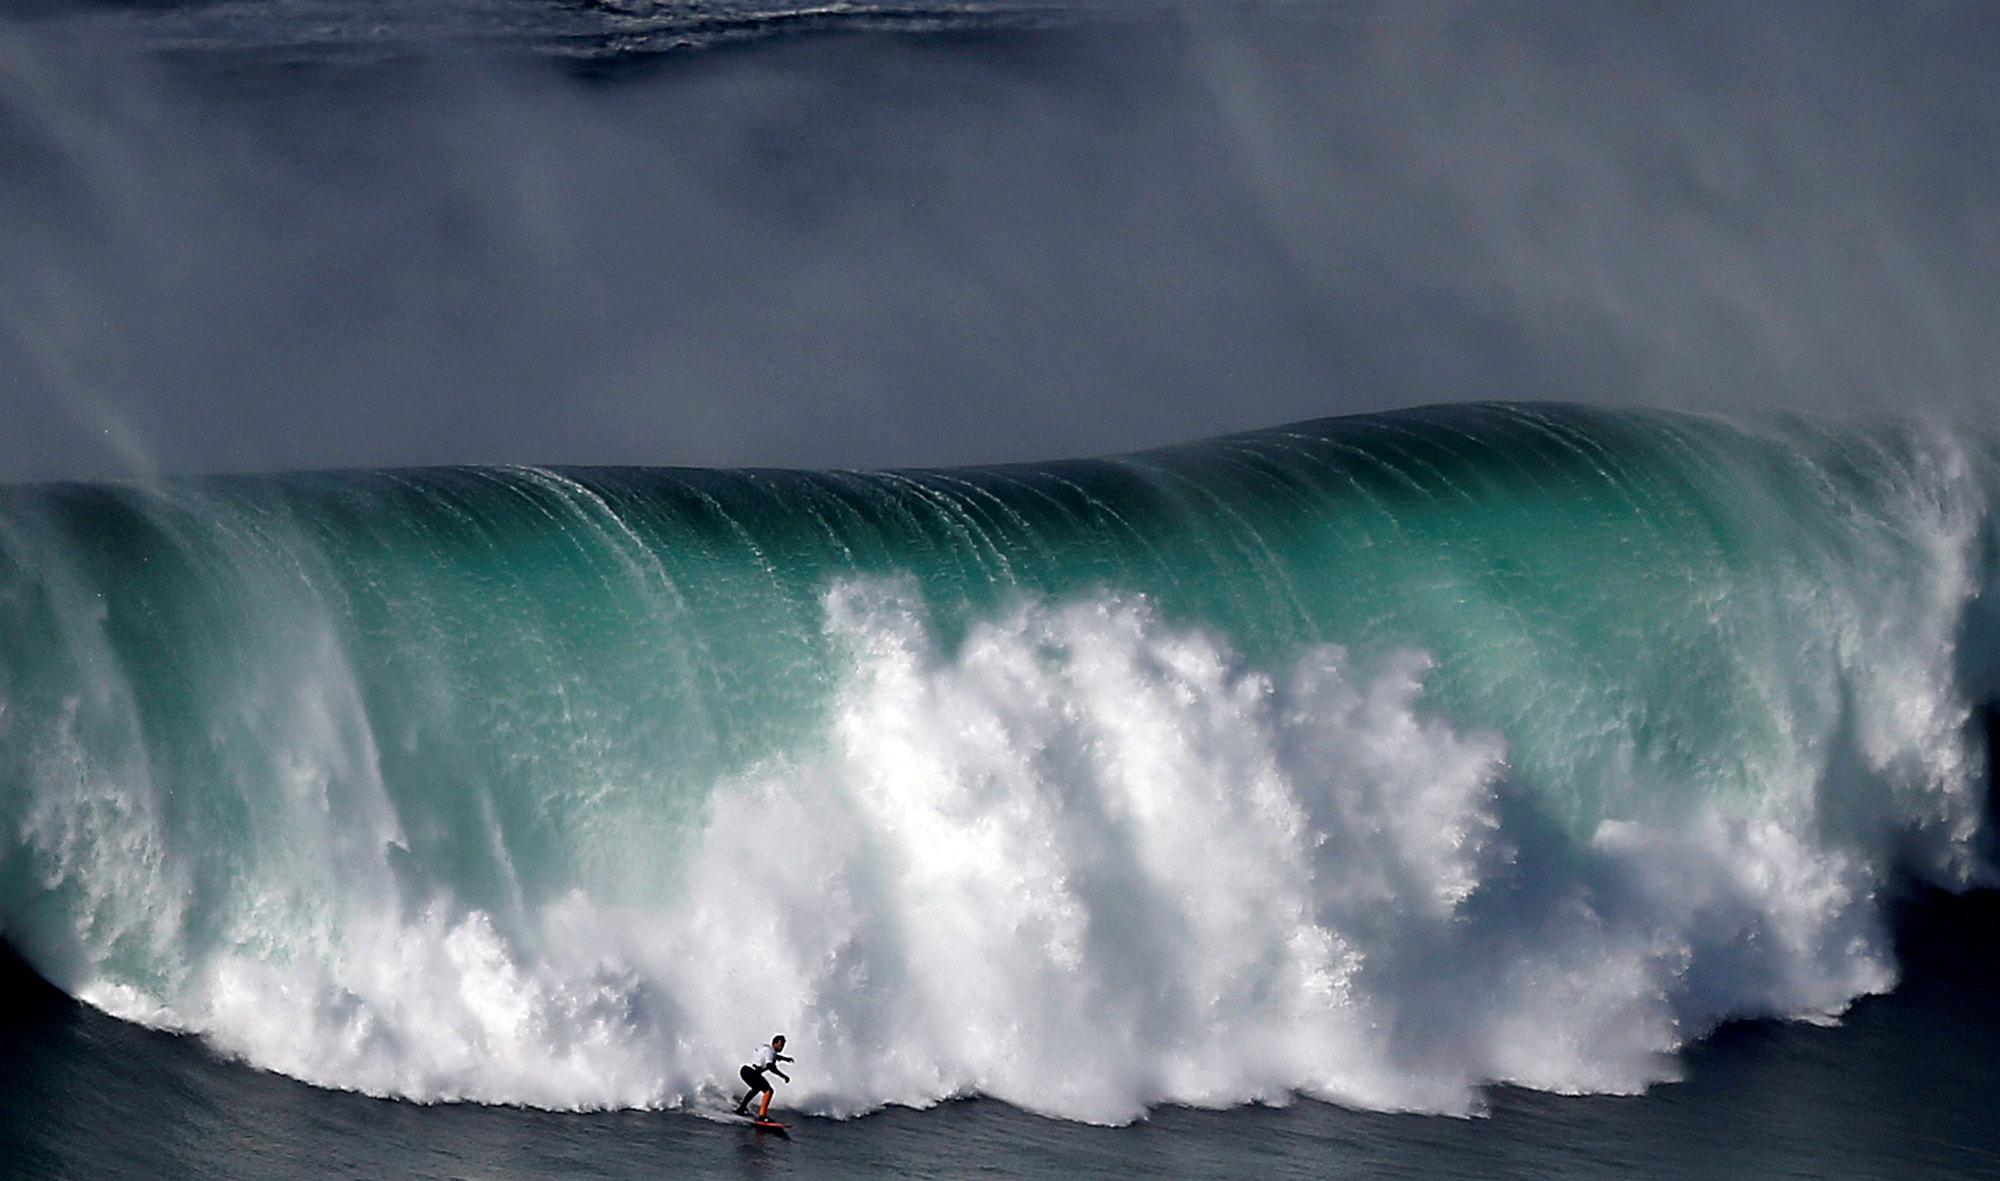 Серфер ловит волну вПрайа-ду-Норте, Португалия.